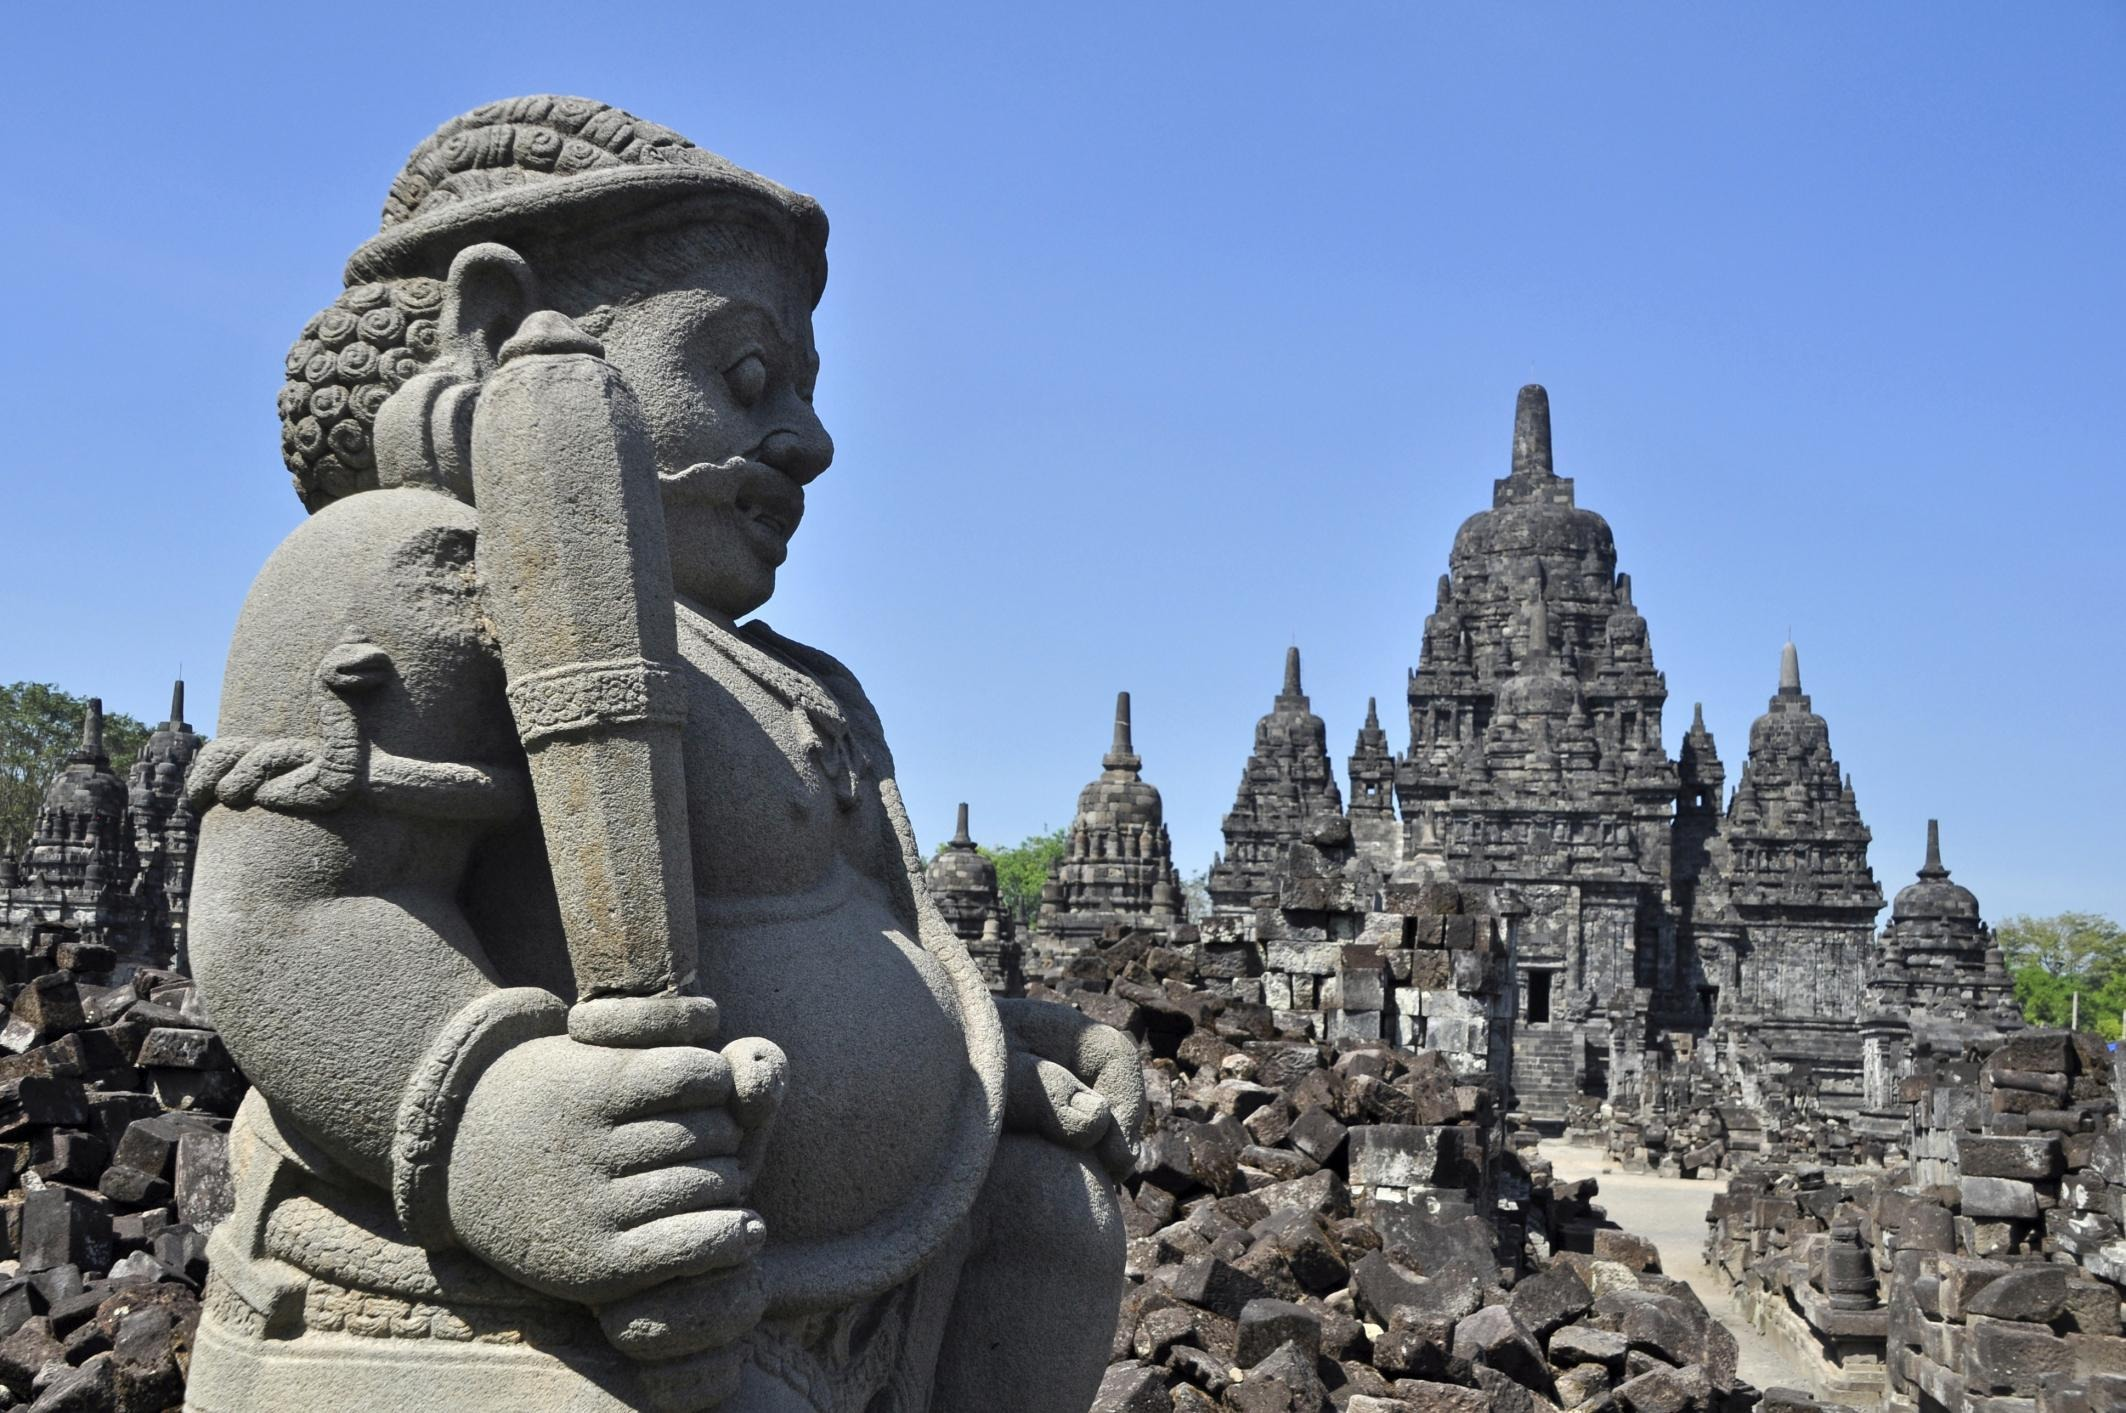 How to Spend 1 Day in Yogyakarta